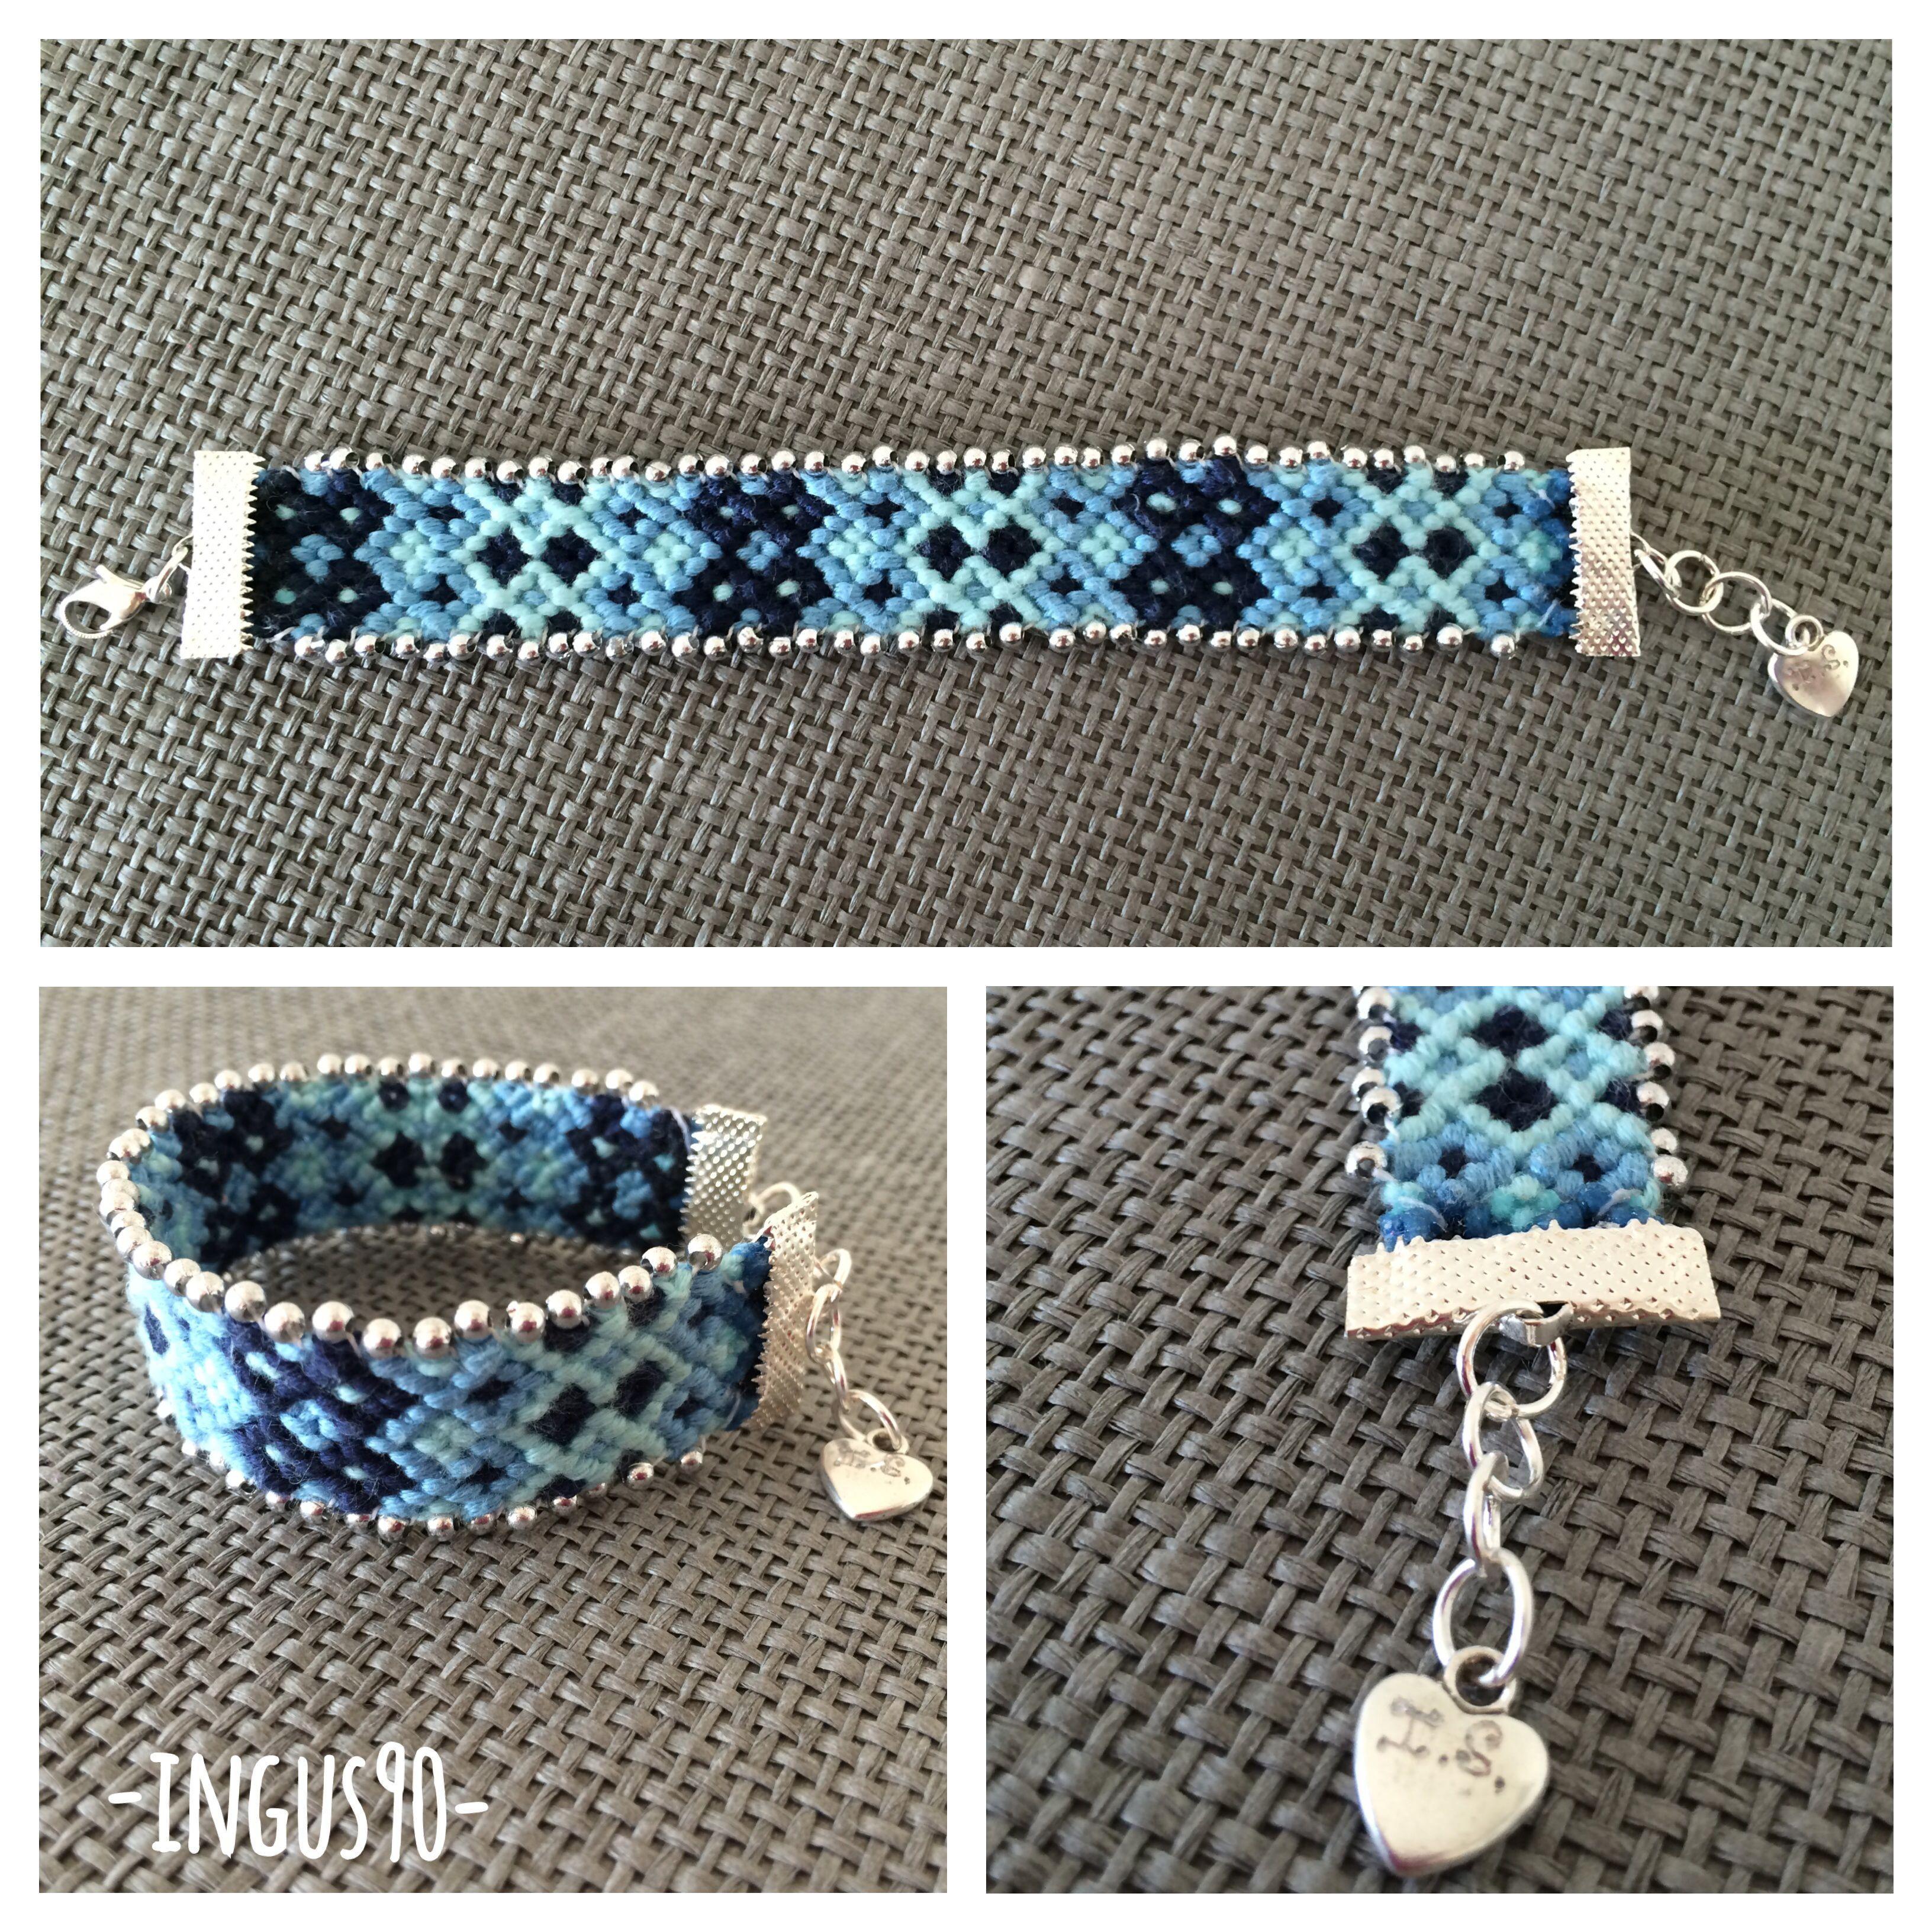 Friendship bracelet. By @ingus90